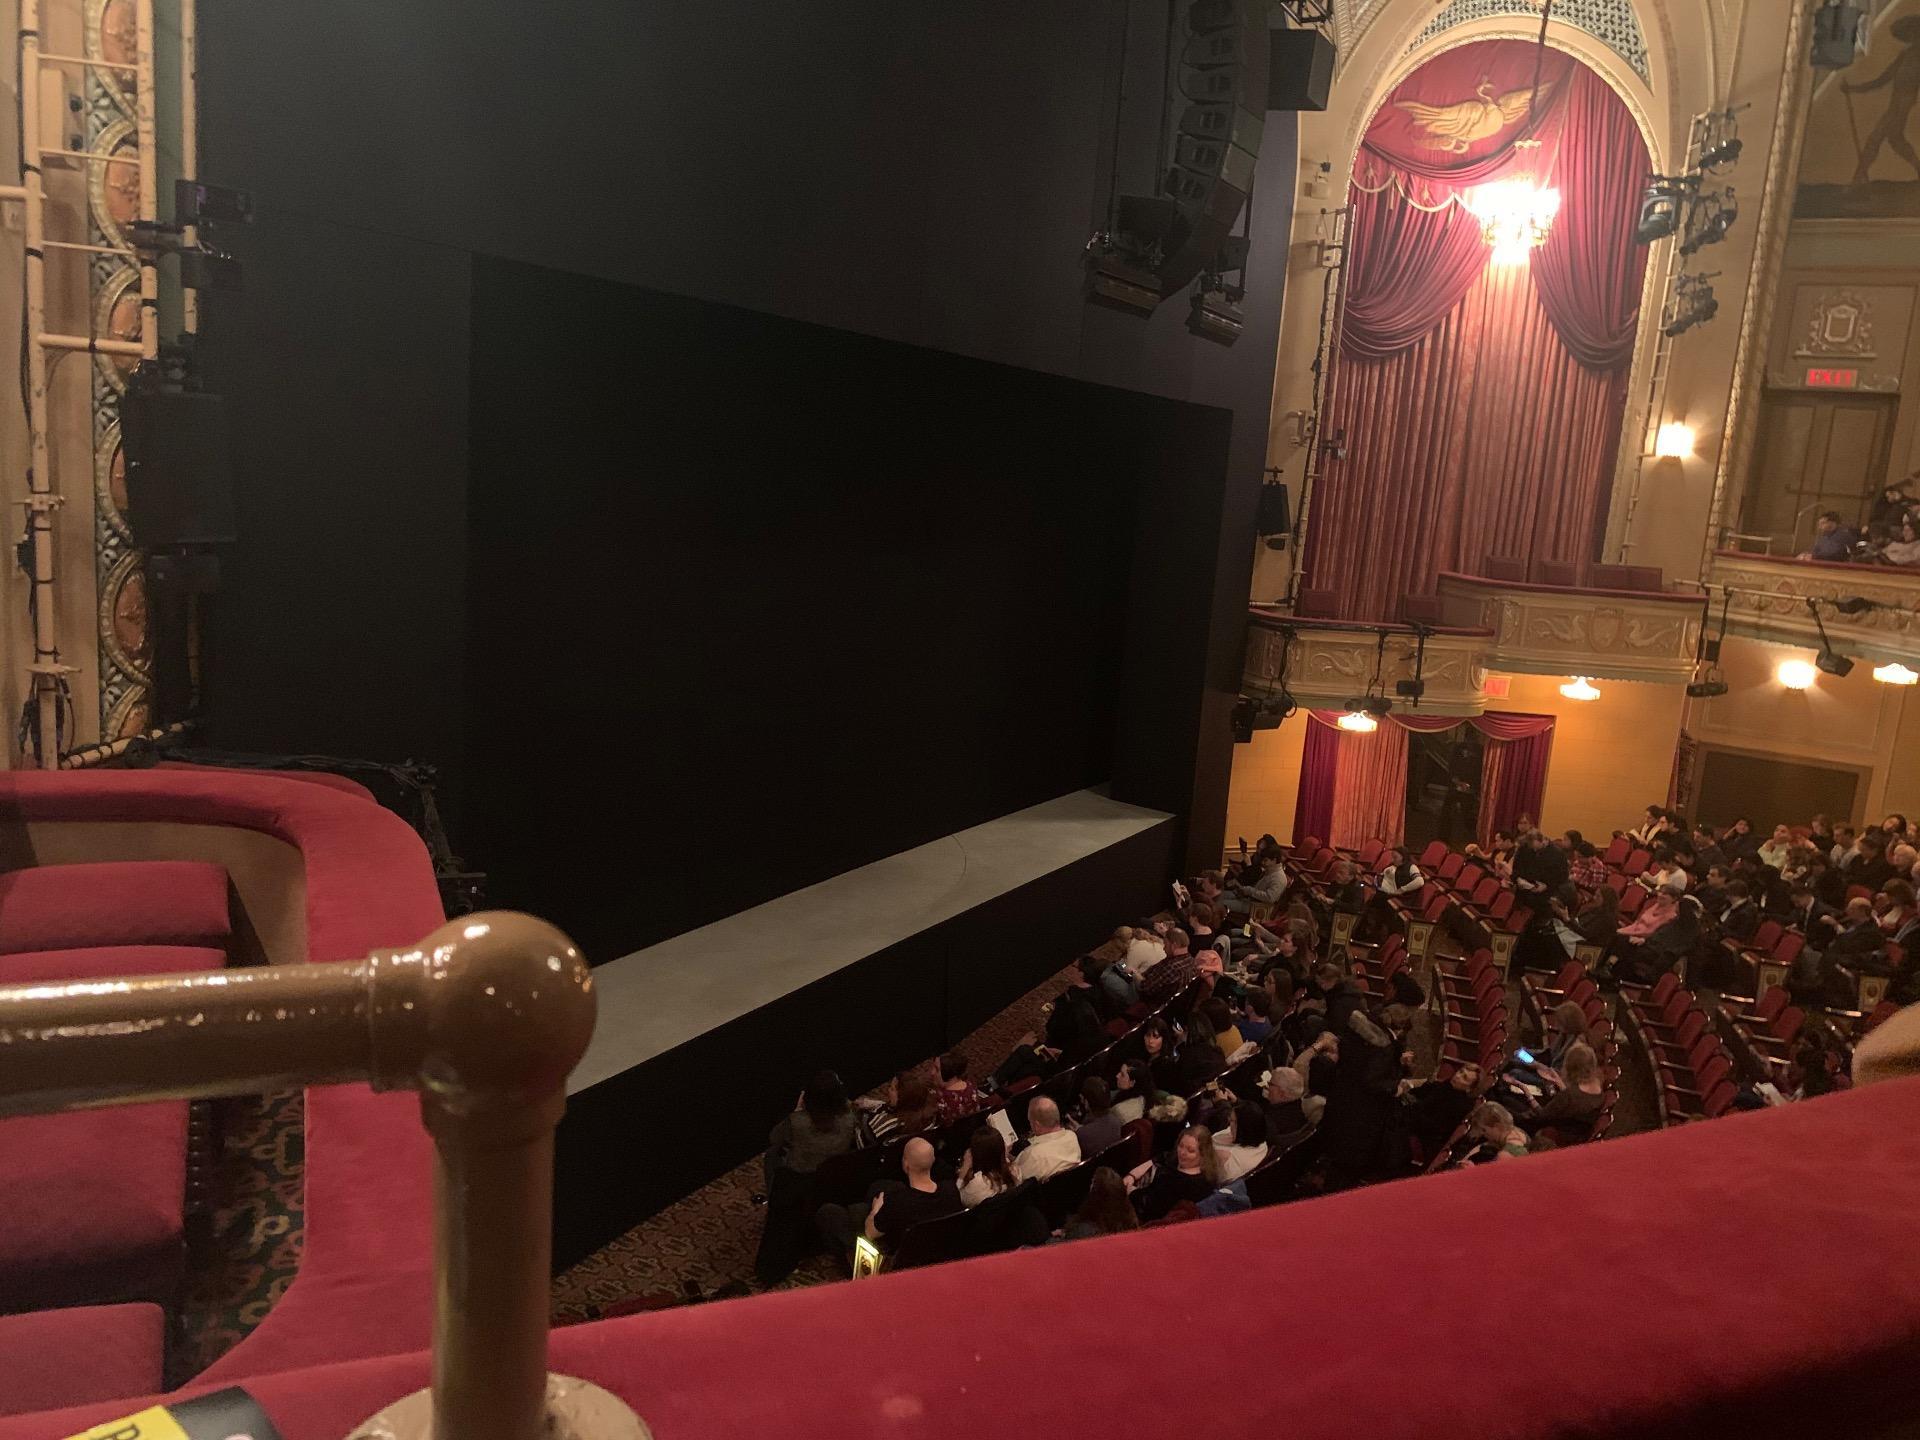 Bernard B. Jacobs Theatre Section Mezzanine L Row A Seat 27